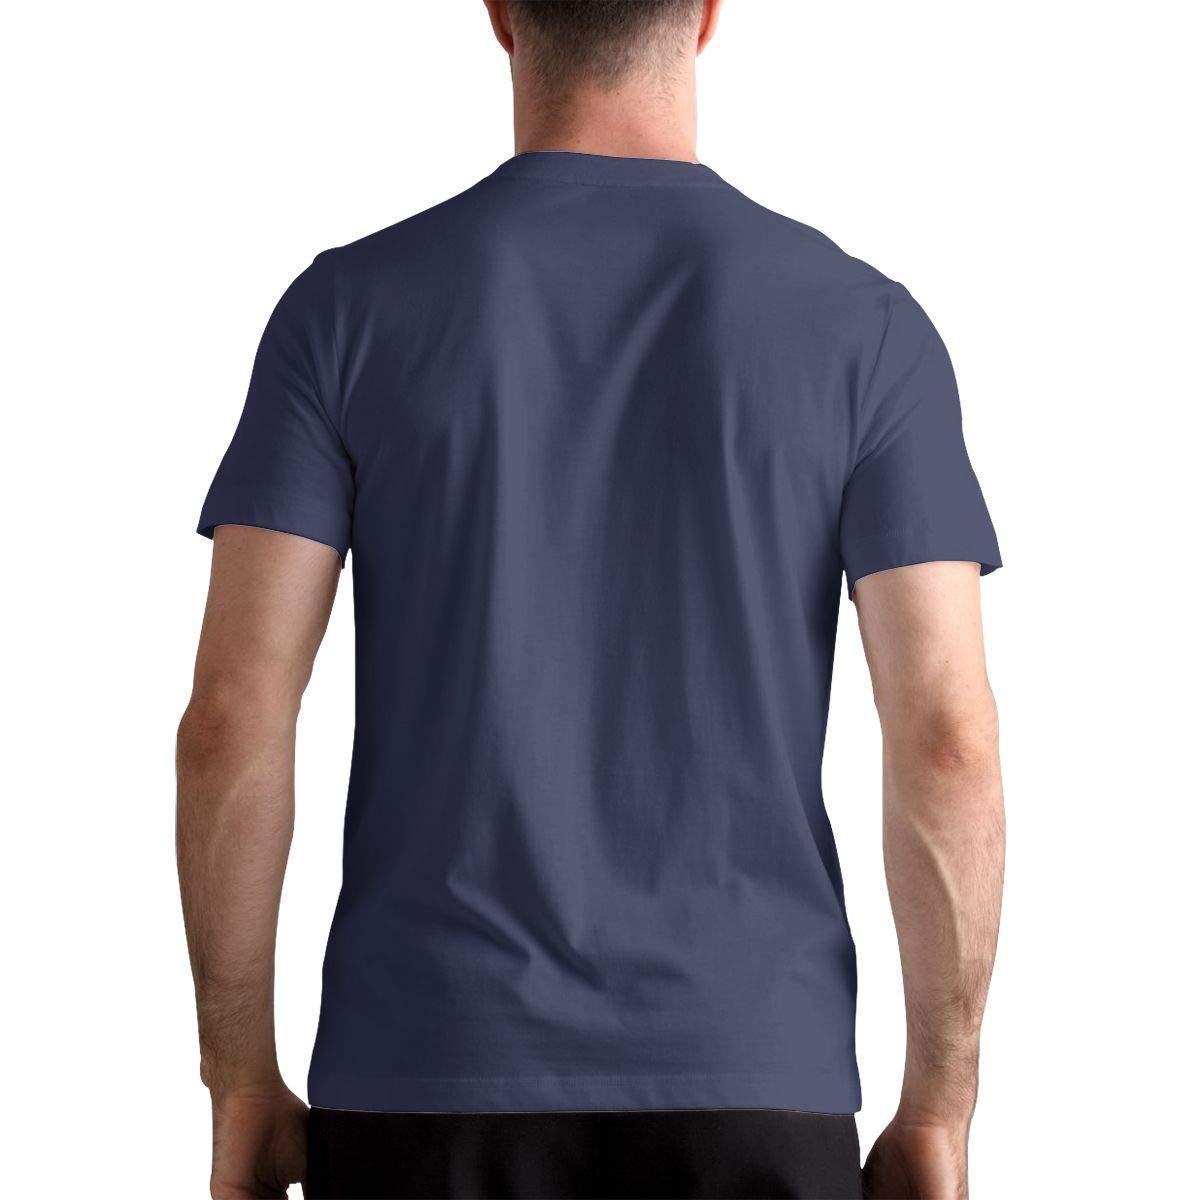 AshleyJLeib Unspeakable Mens Loose Short Sleeve Tshirts